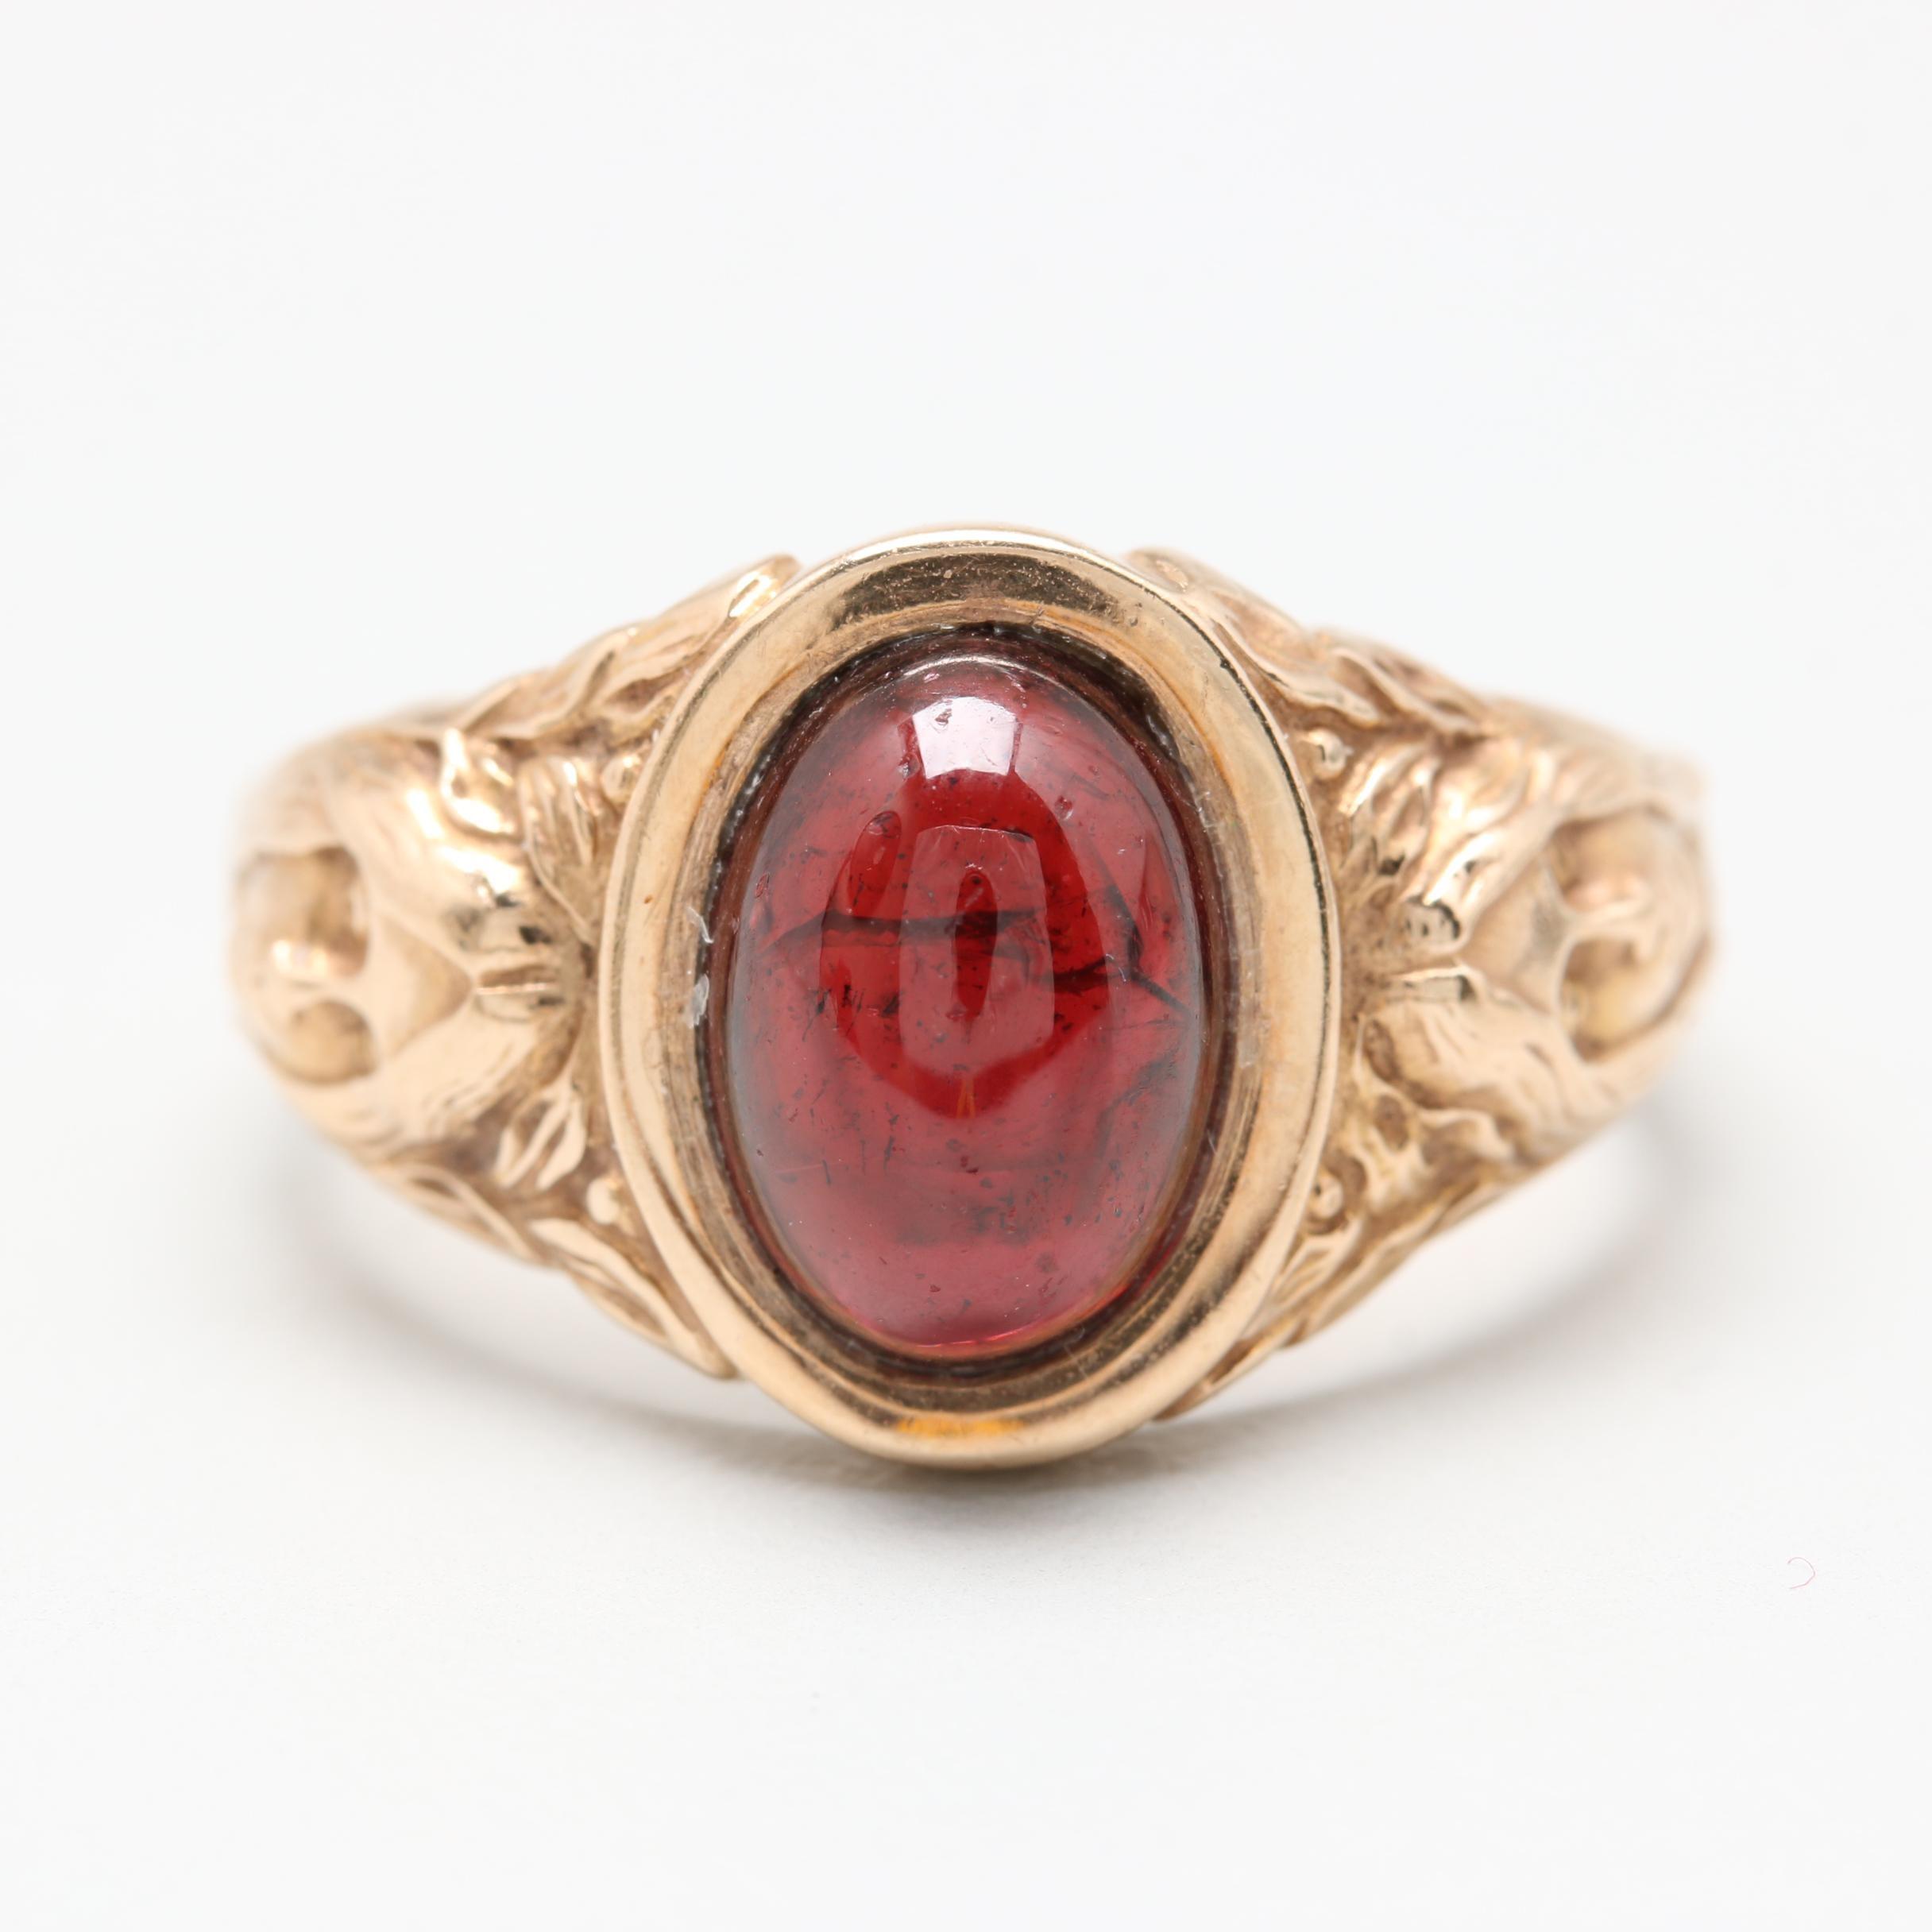 Art Nouveau Style 10K Yellow Gold Garnet Ring